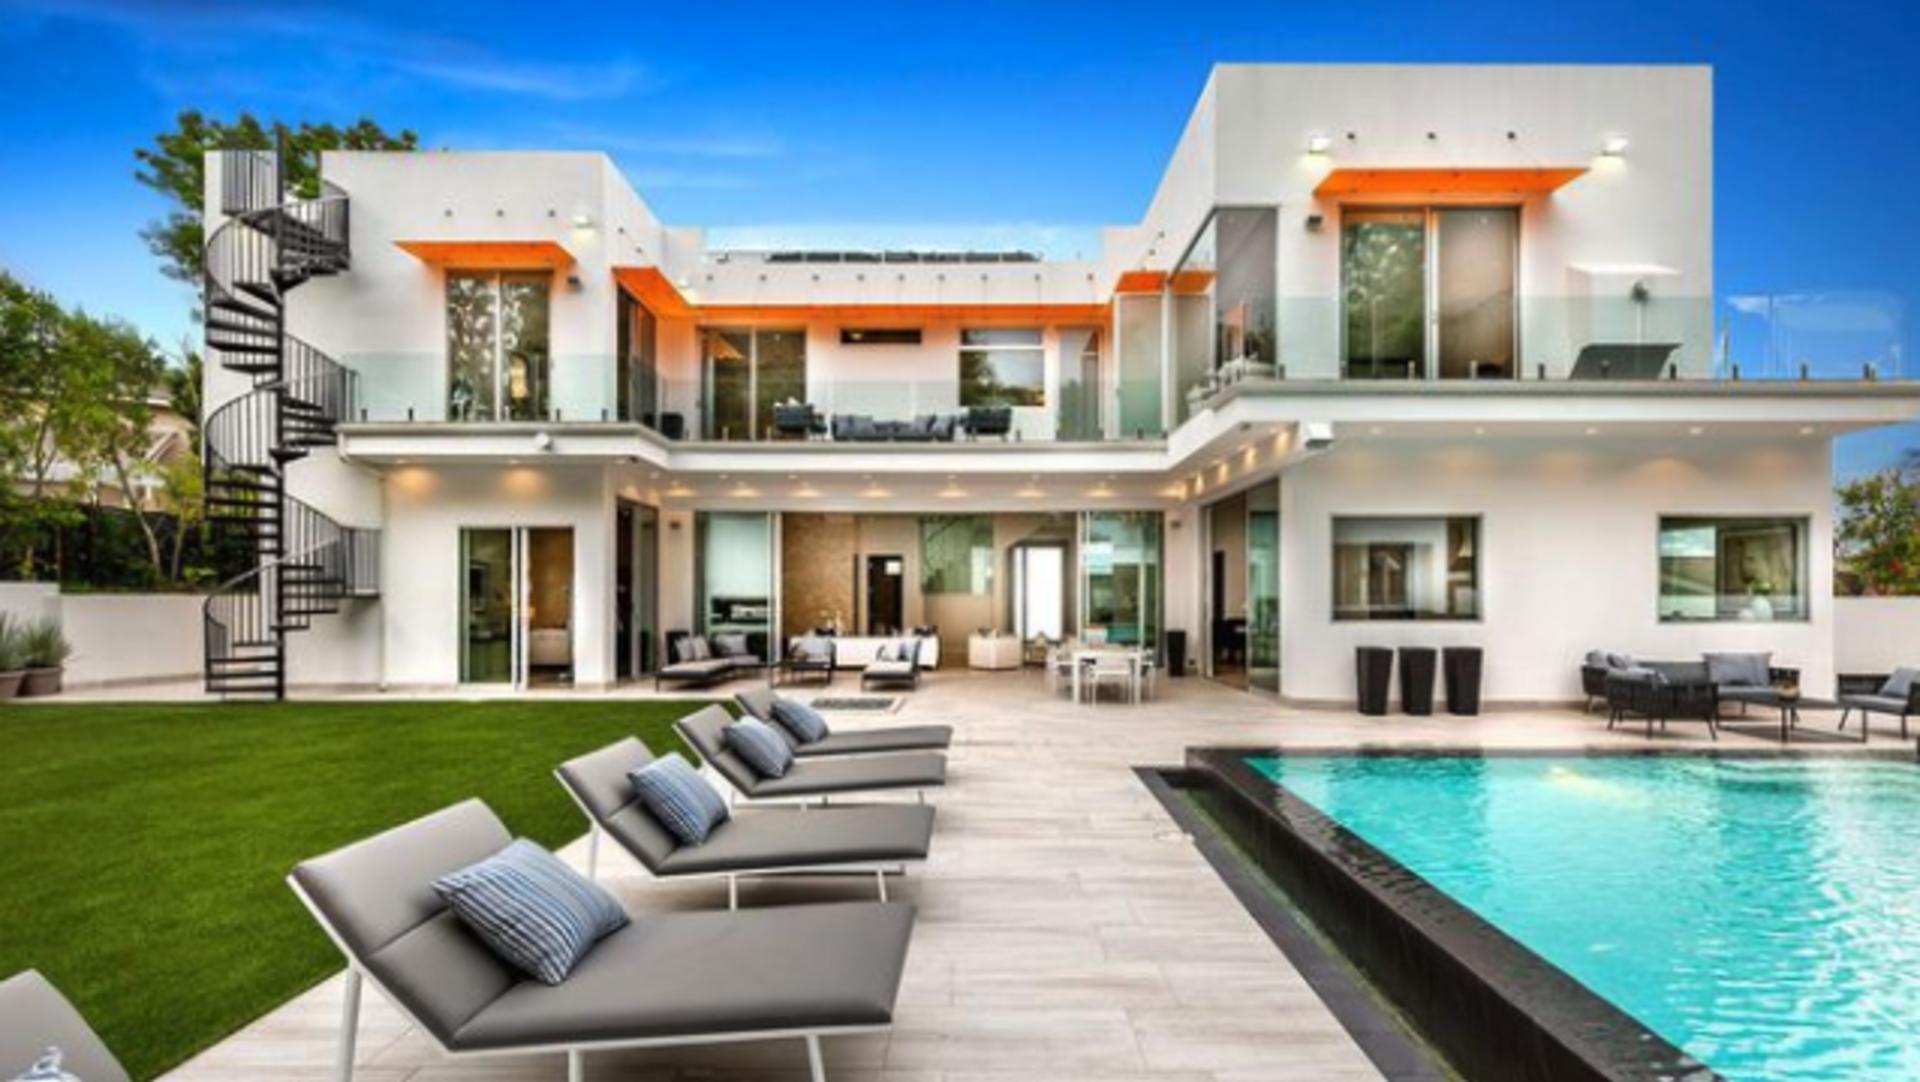 'La La Land' House Makes a Big Splash on the Market